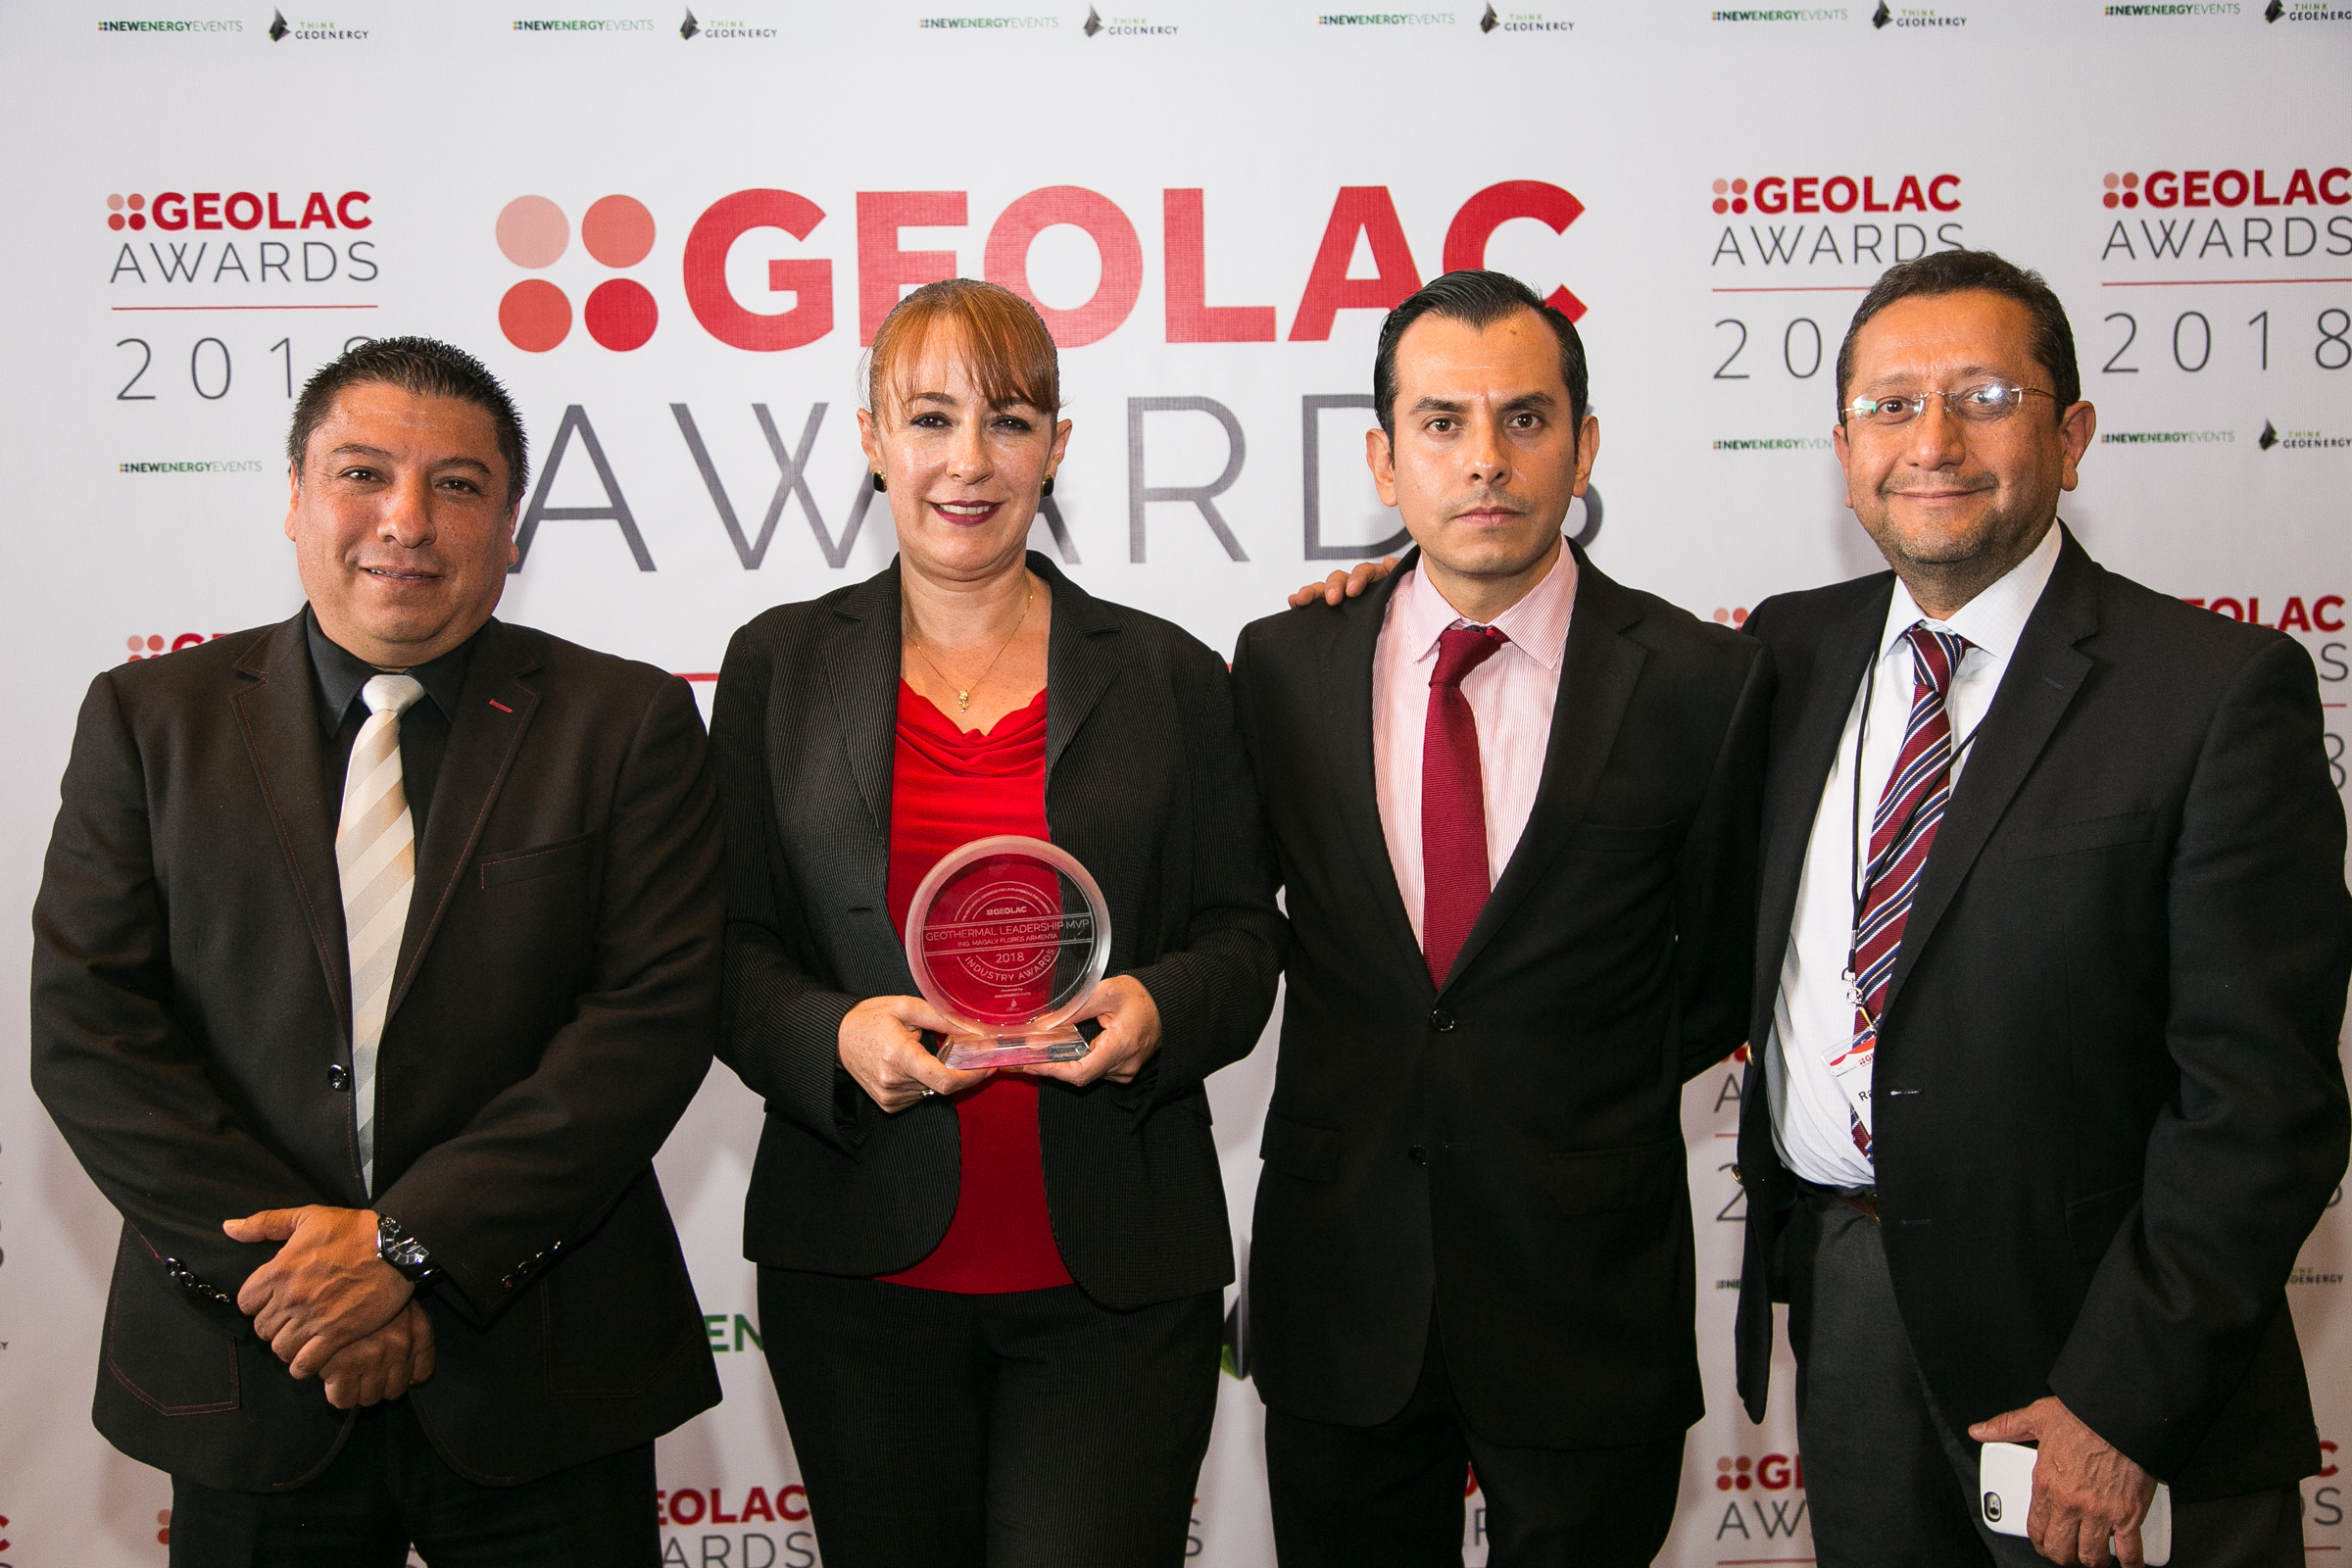 GEOLAC-5967